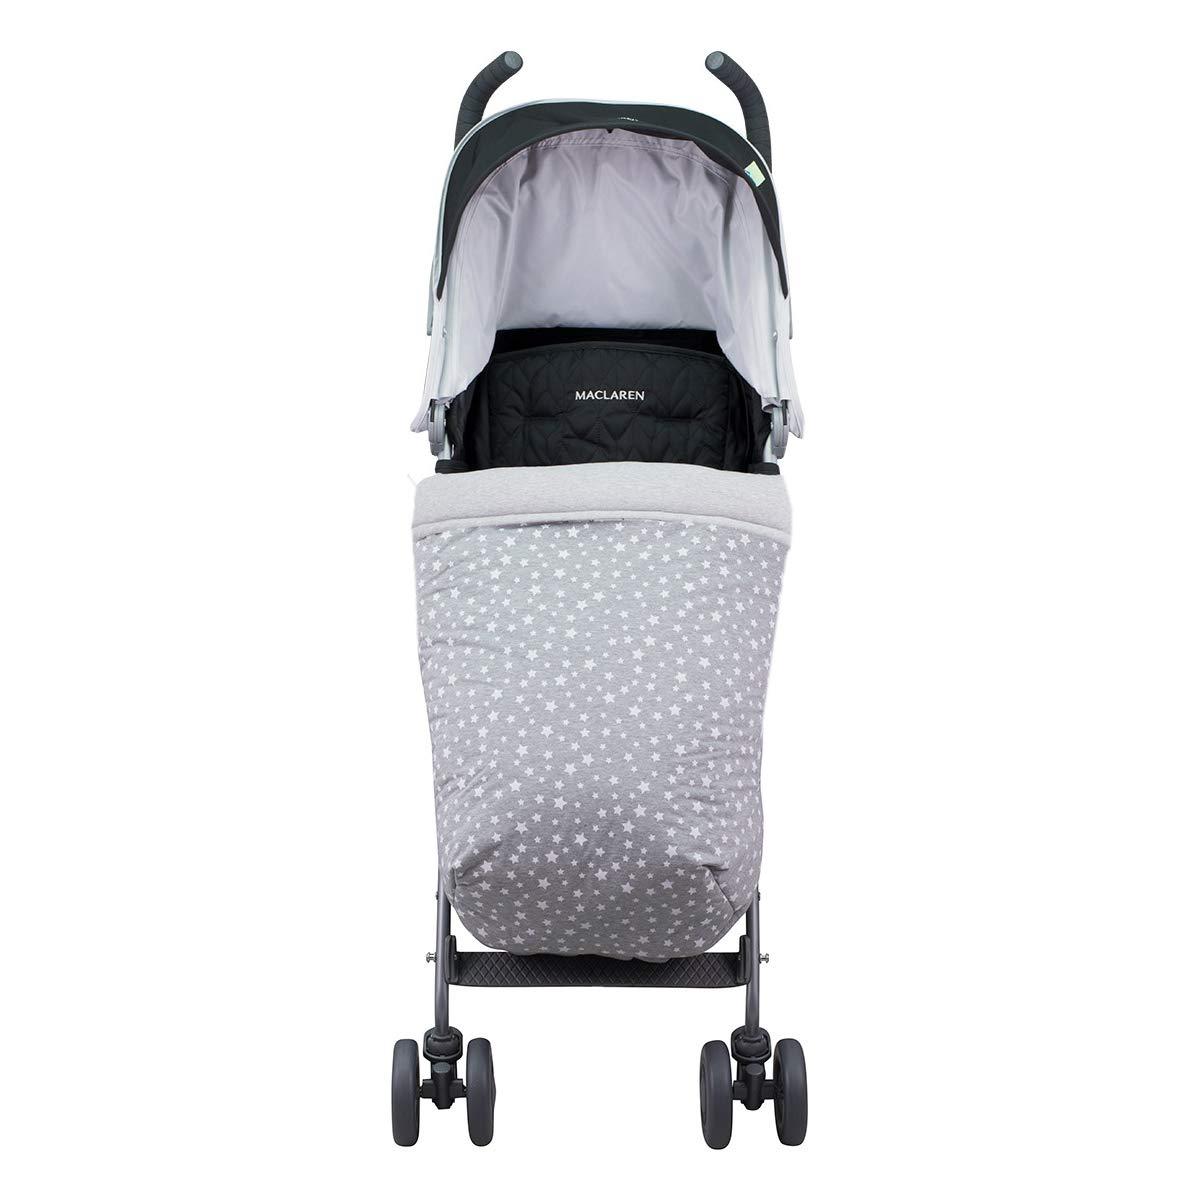 Janabebé Universal Baby Blanket Footmuff for Pushchairs (White Star, Cotton)